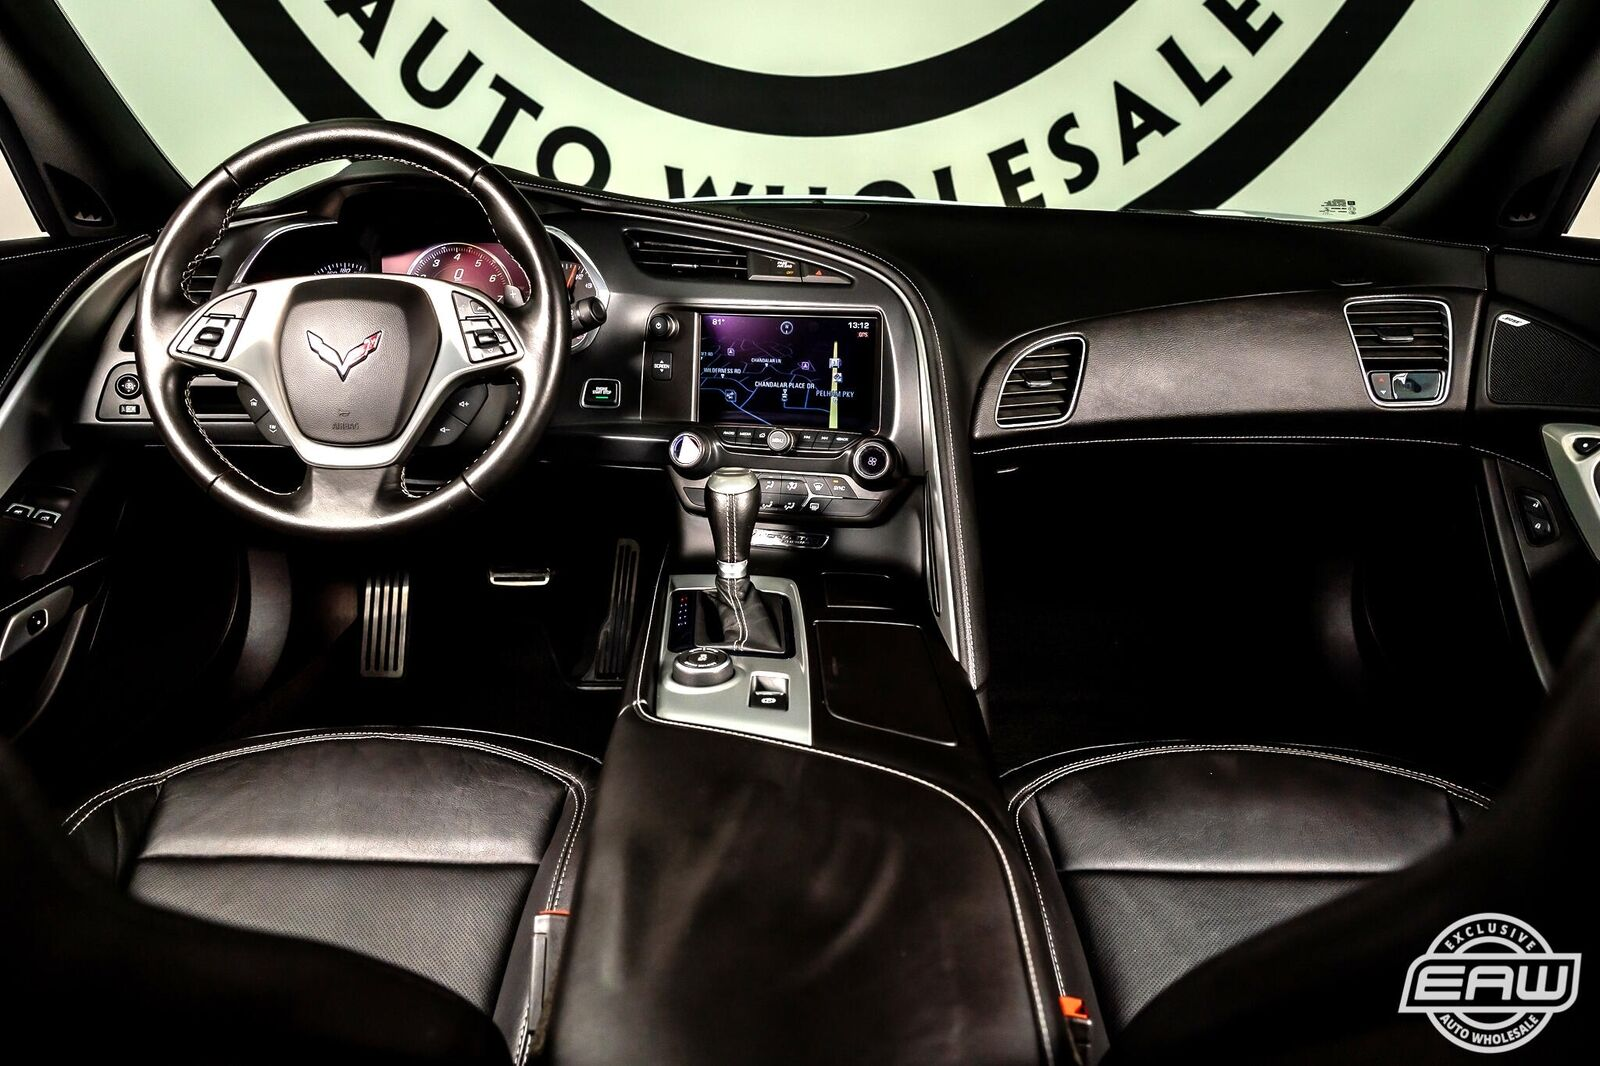 2014 White Chevrolet Corvette Coupe 1LT   C7 Corvette Photo 2